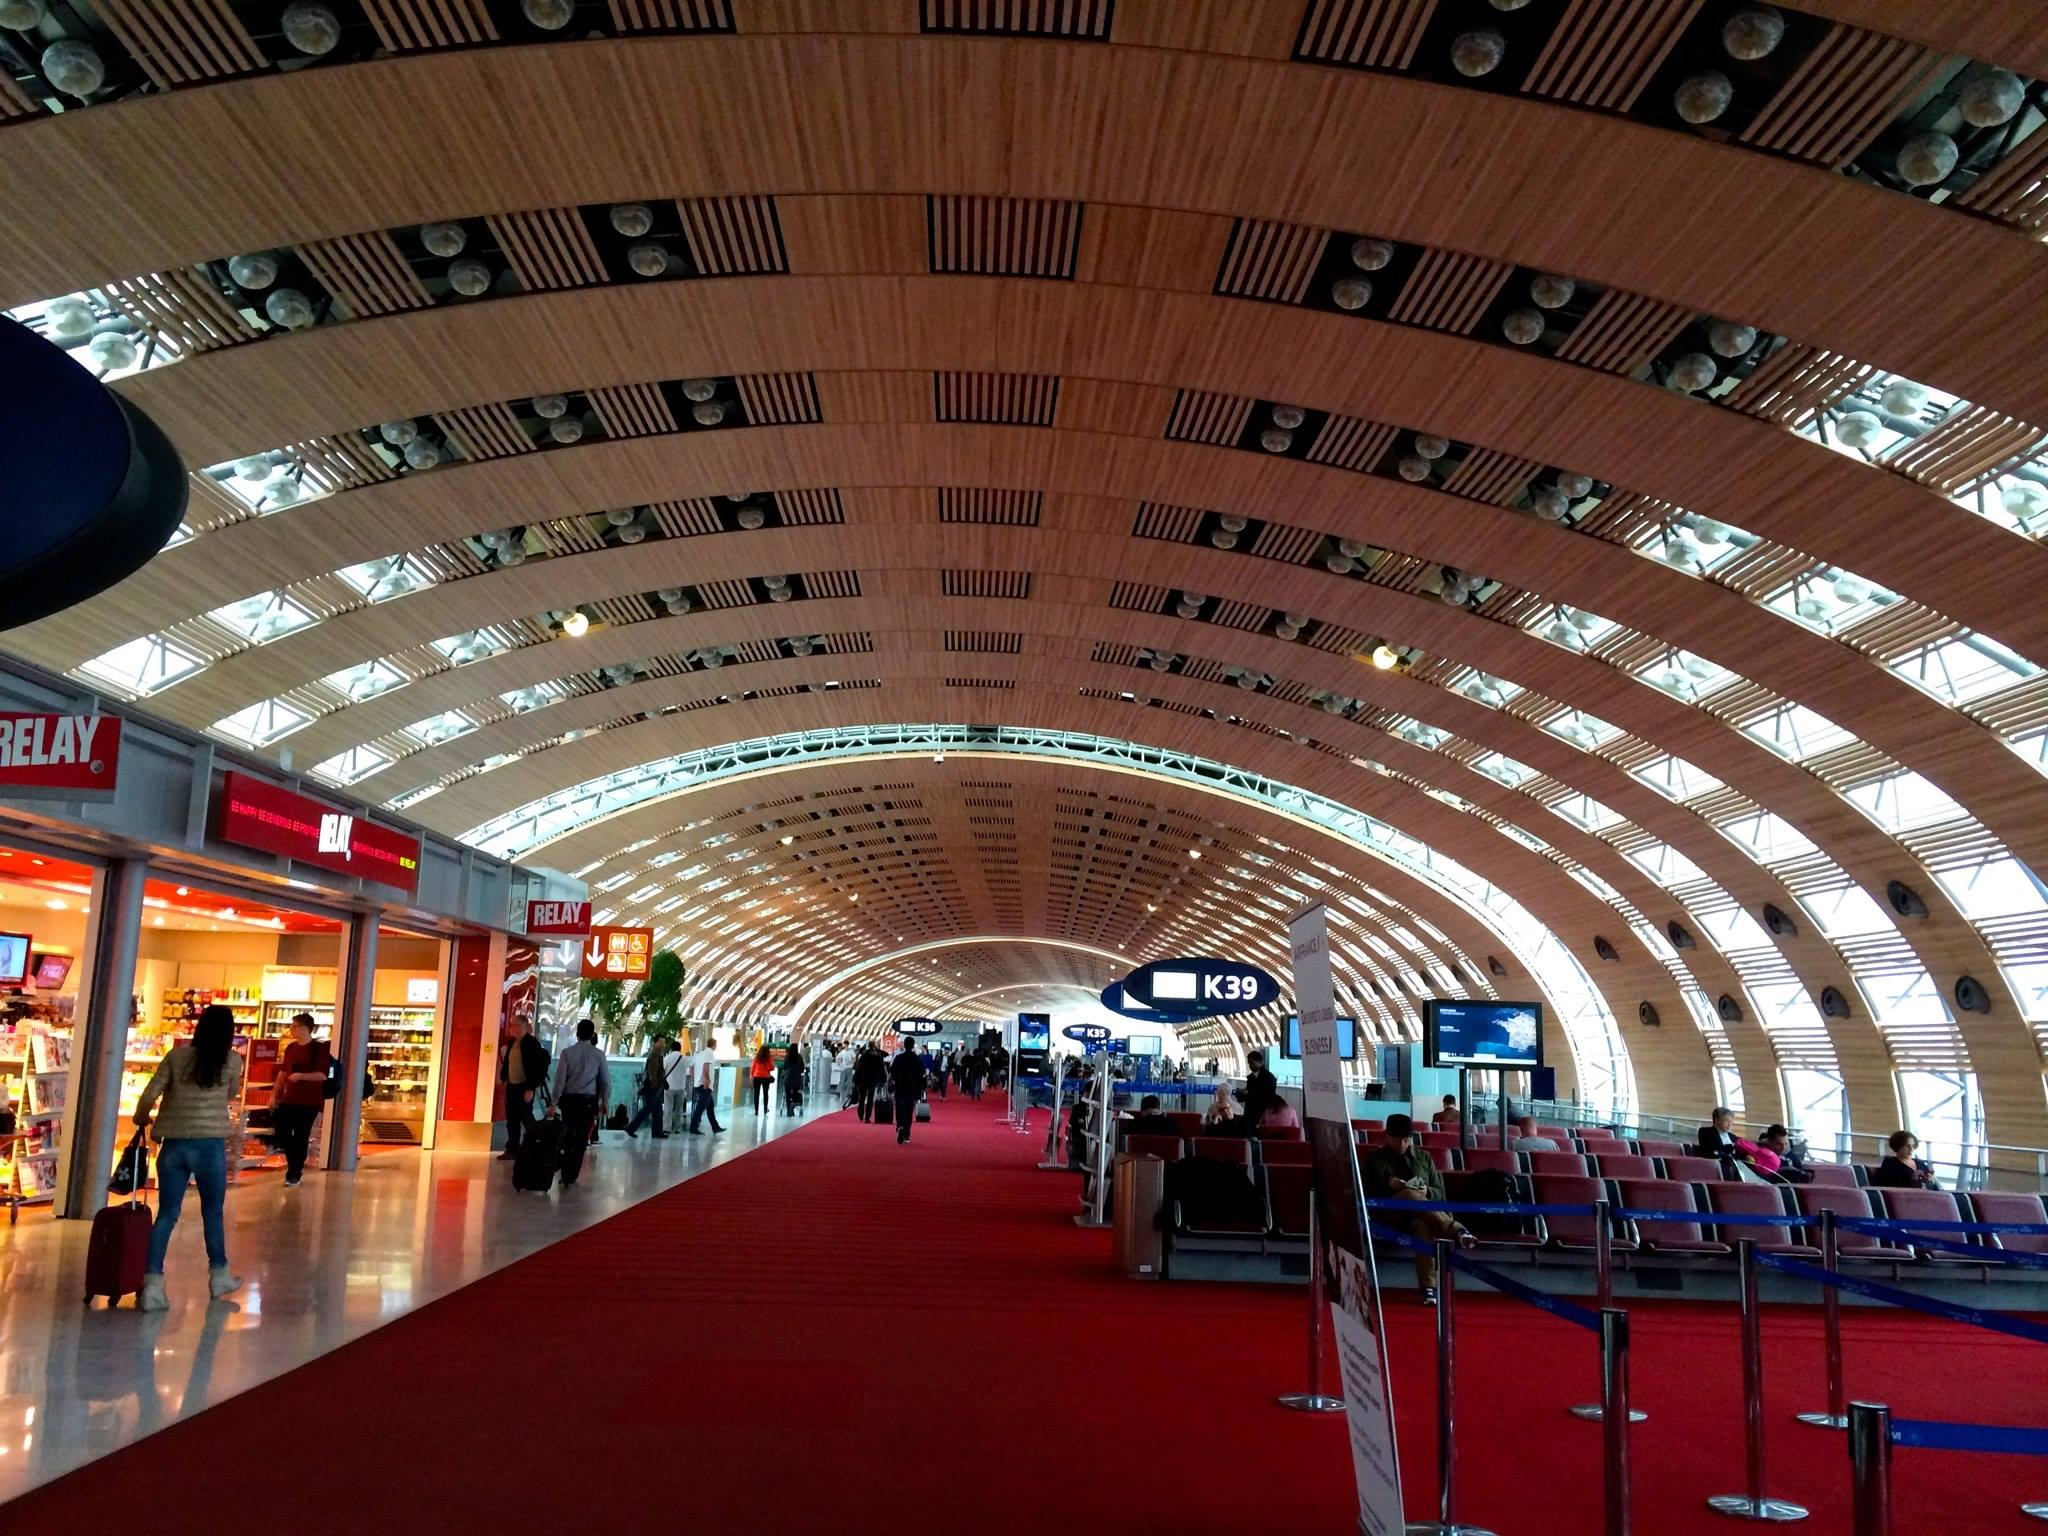 Paris Airport - Charles de Gaulle